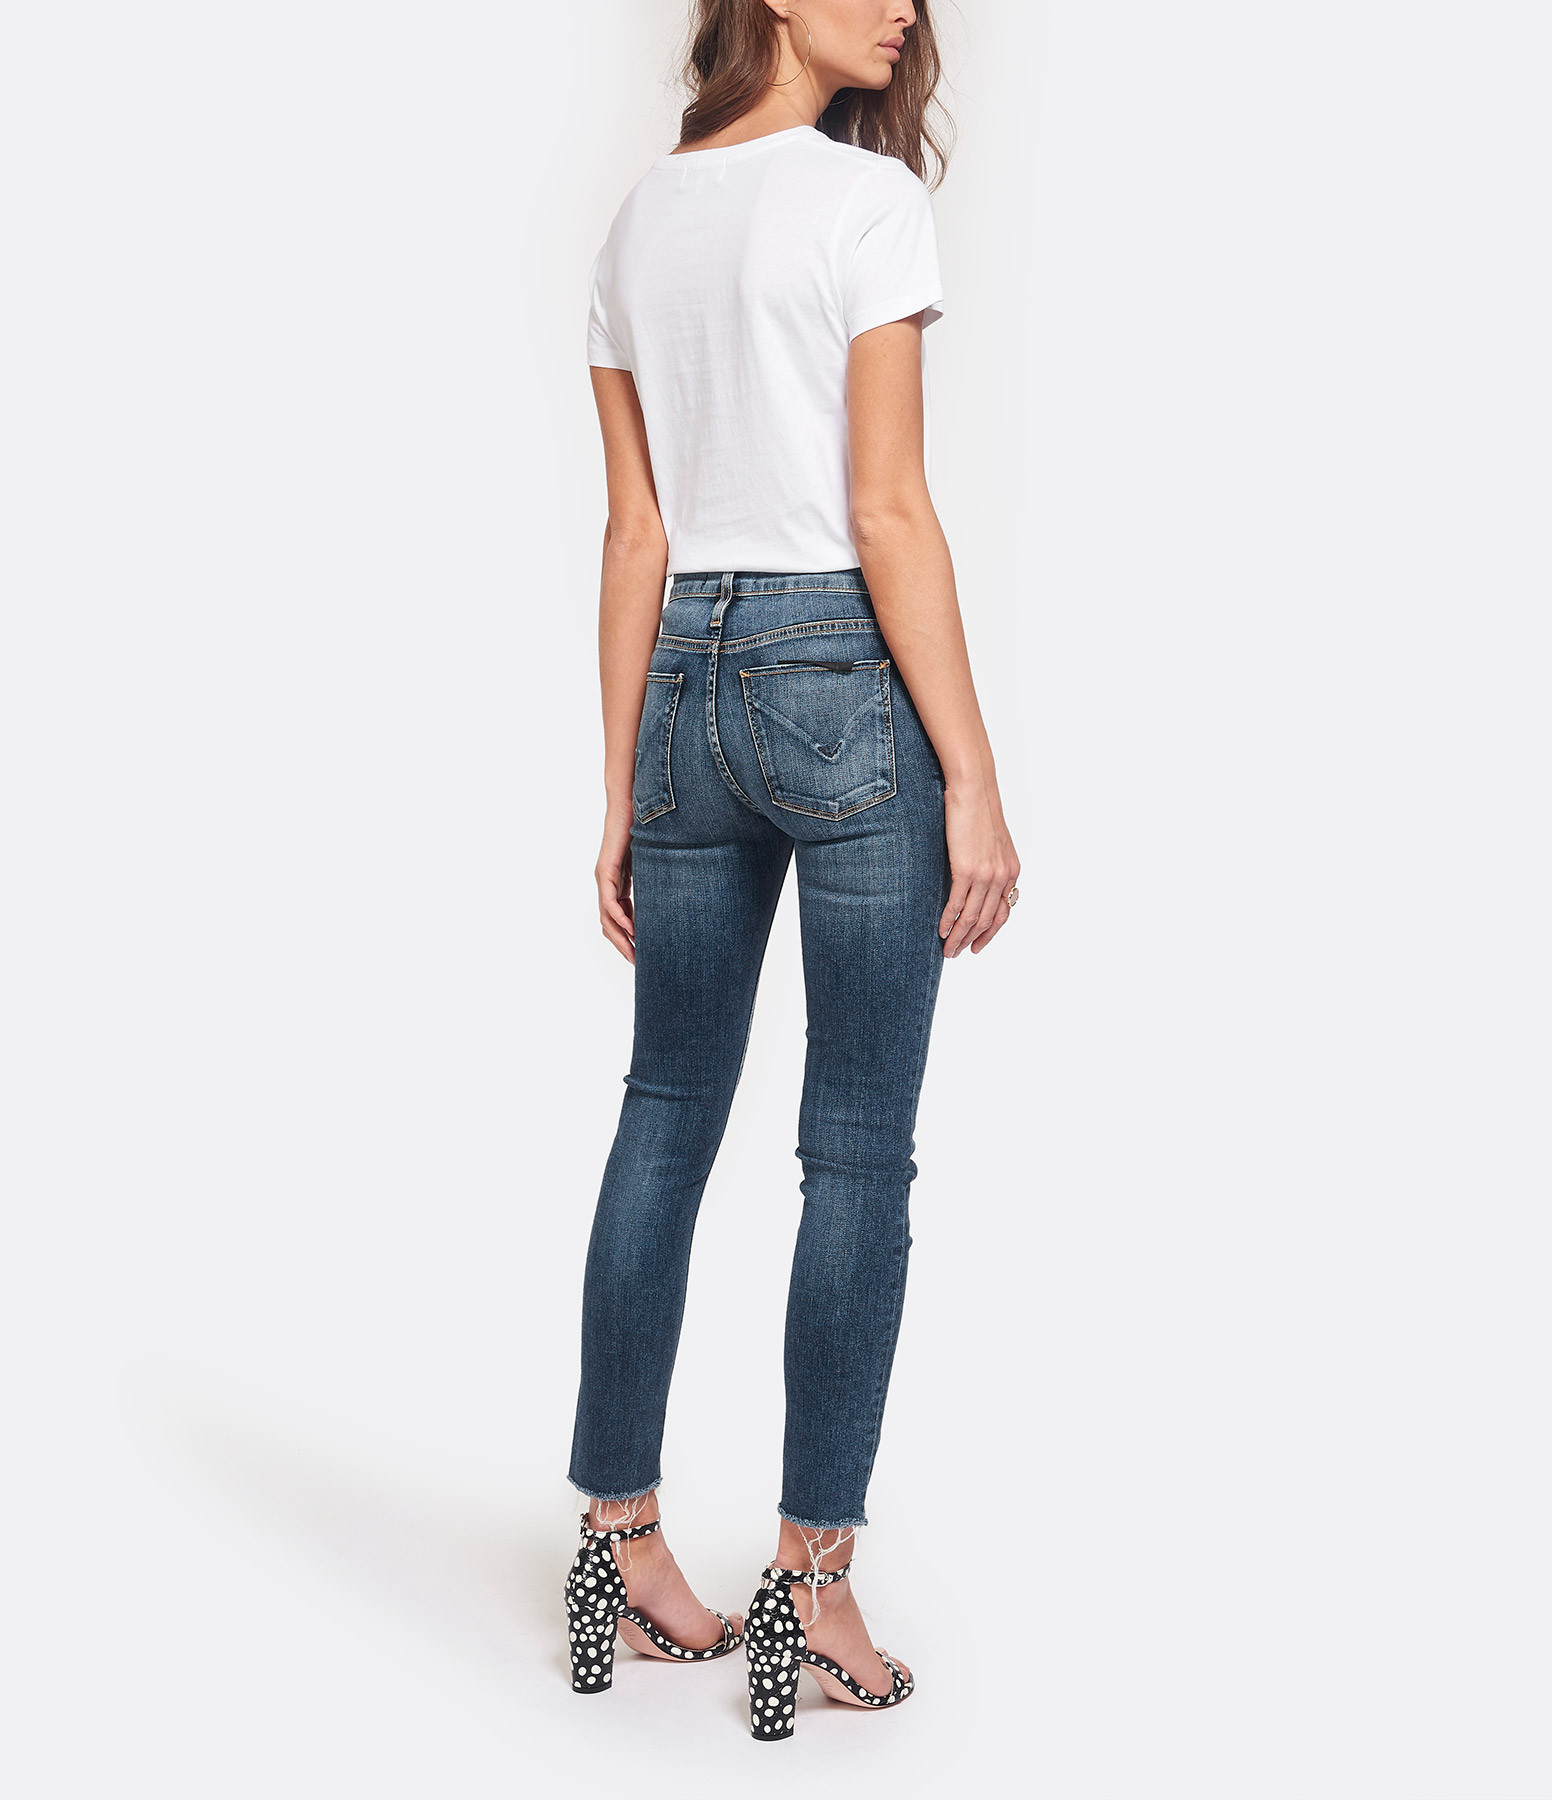 MAISON LABICHE - Tee-shirt Boyfriend Oui Non Coton Blanc Noir